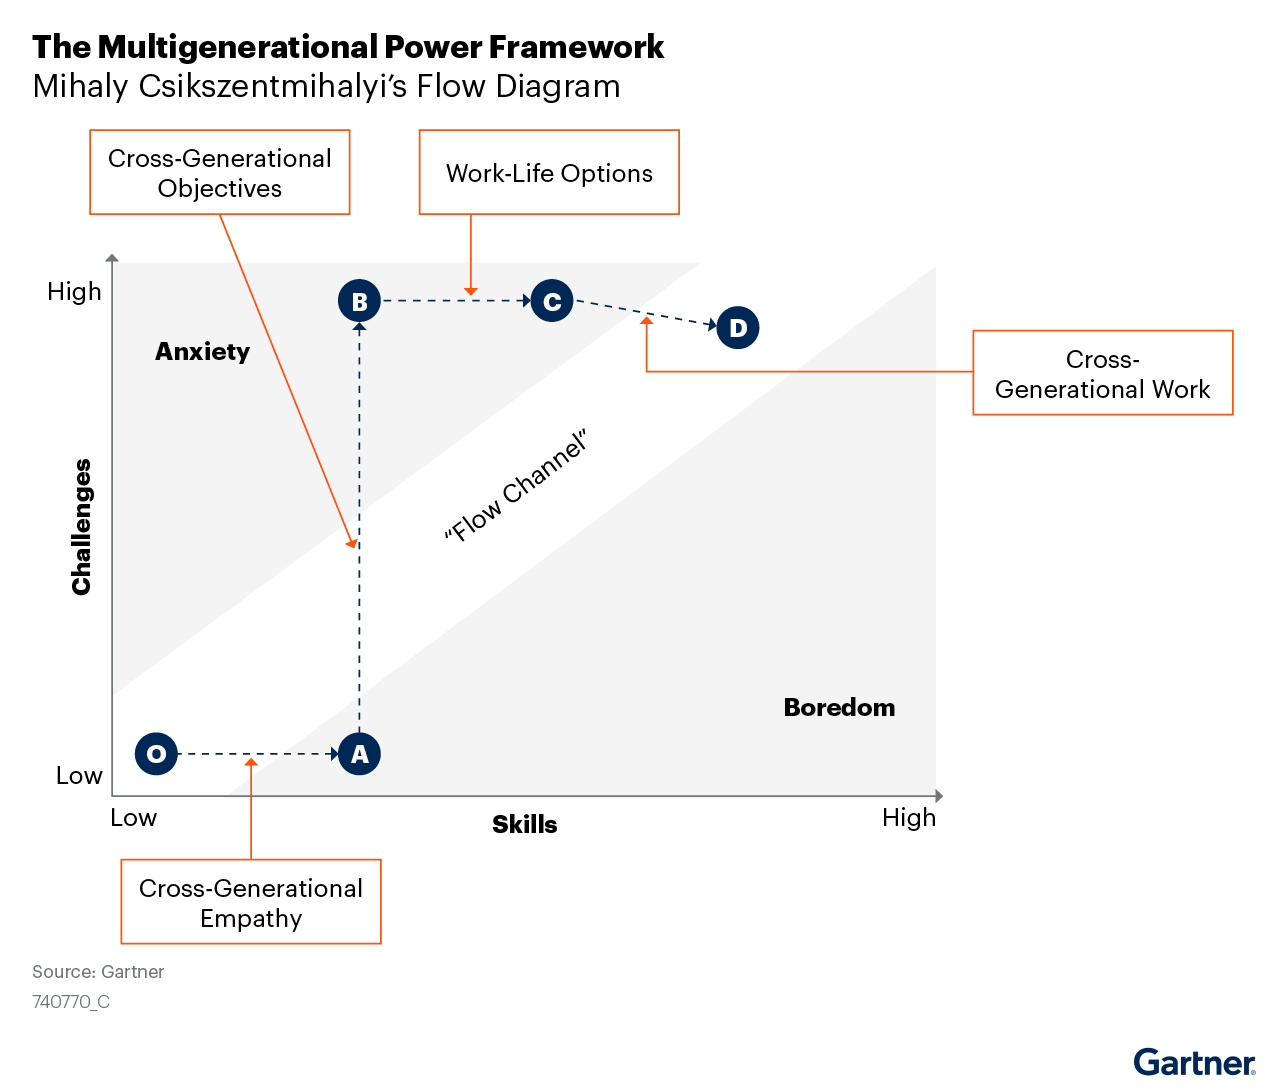 Flow diagram of the Multigenerational Power Framework.